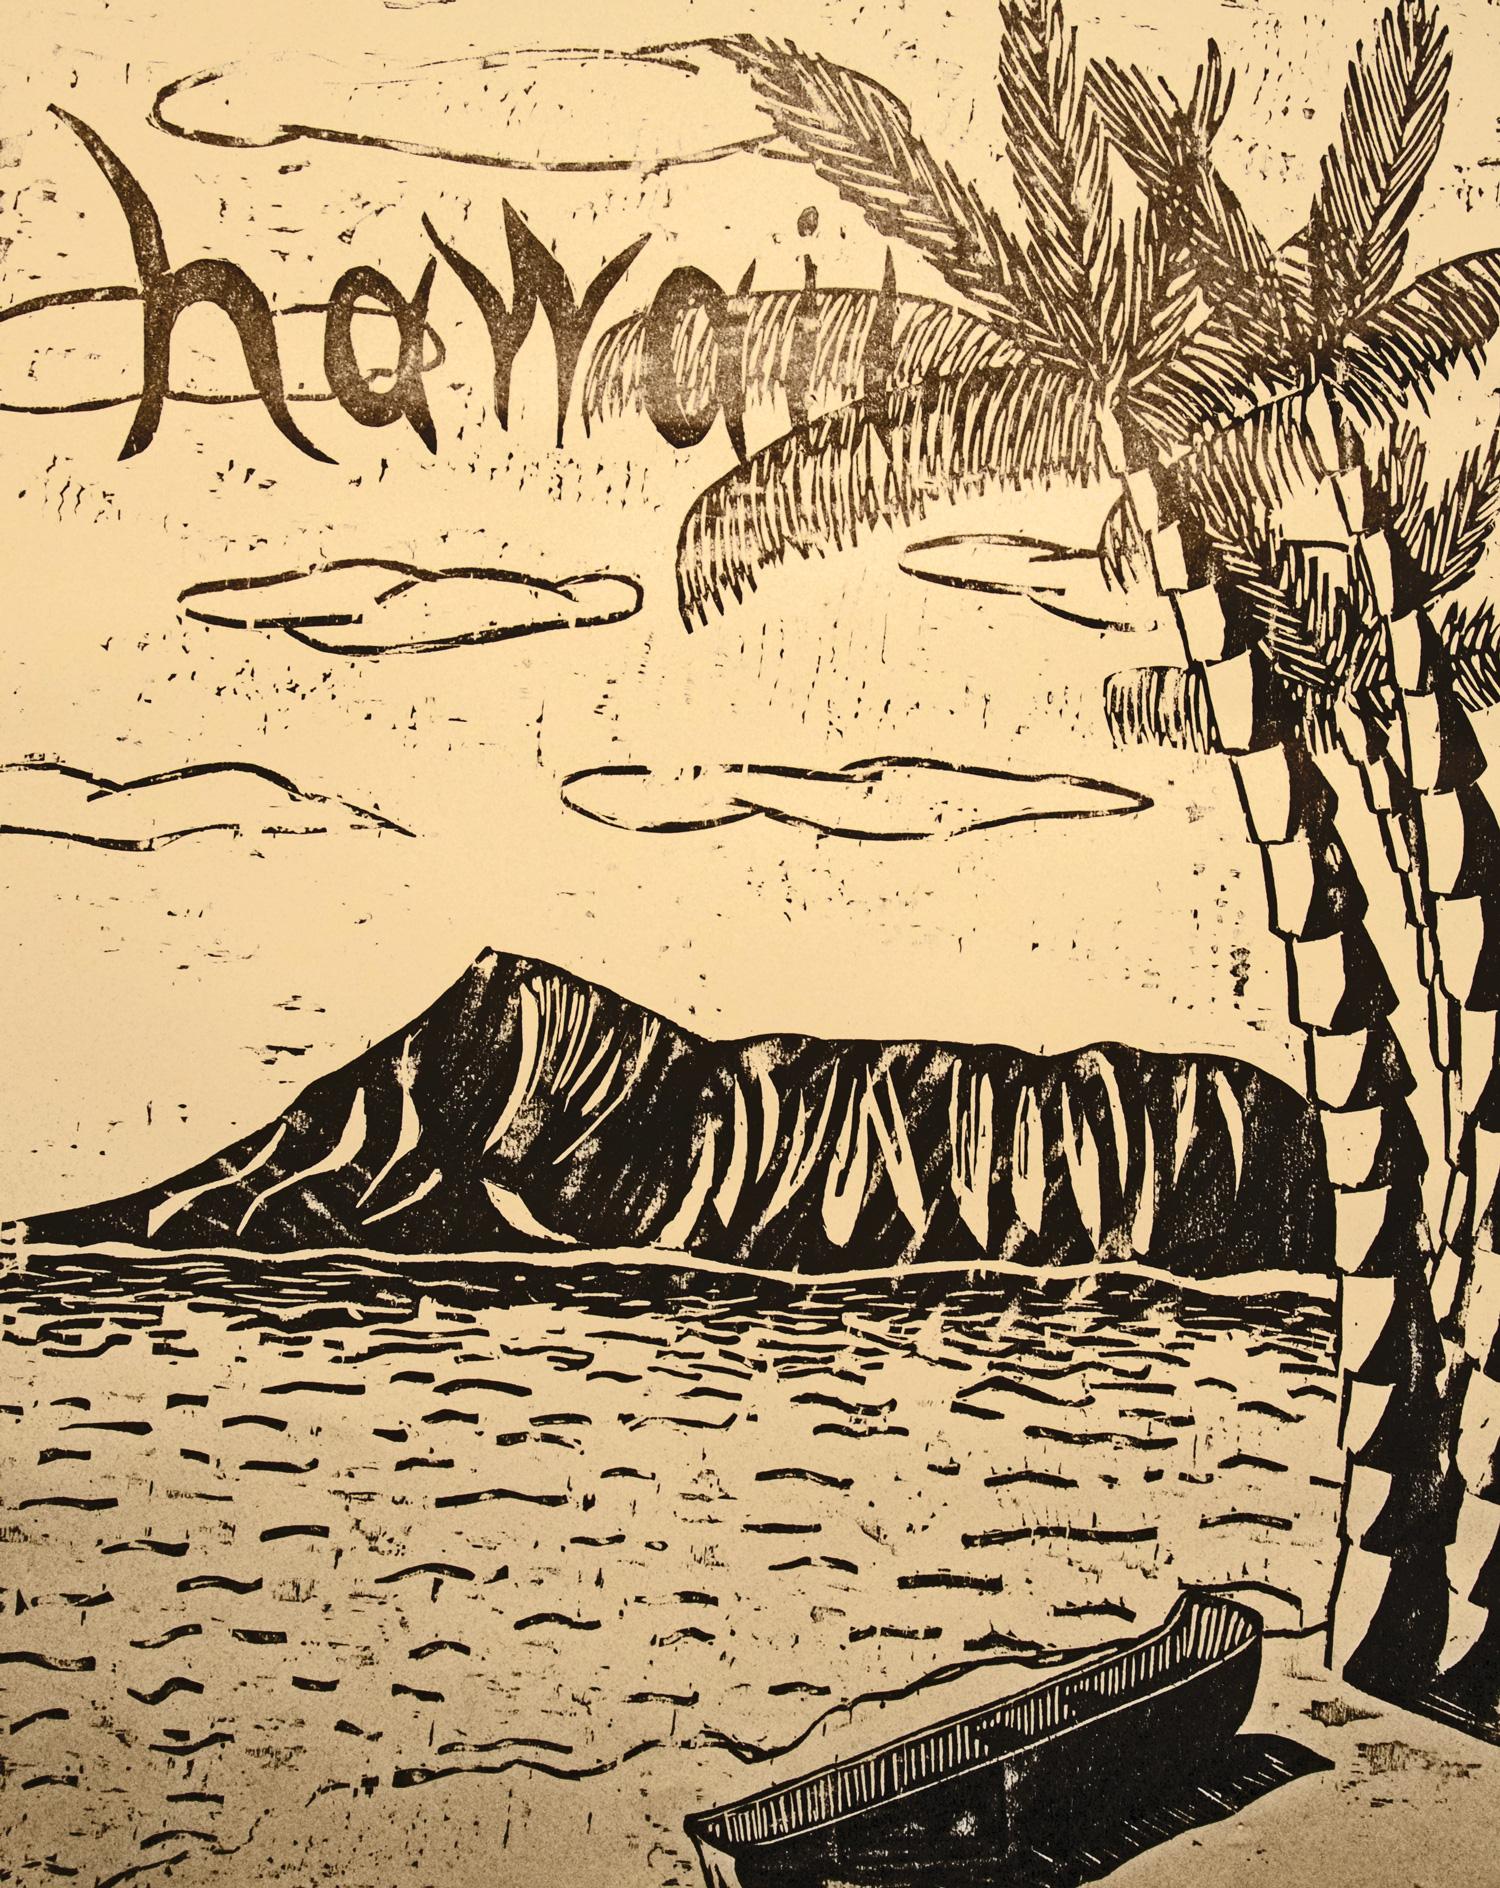 Hawaii woodcut print, by Tara Marolf